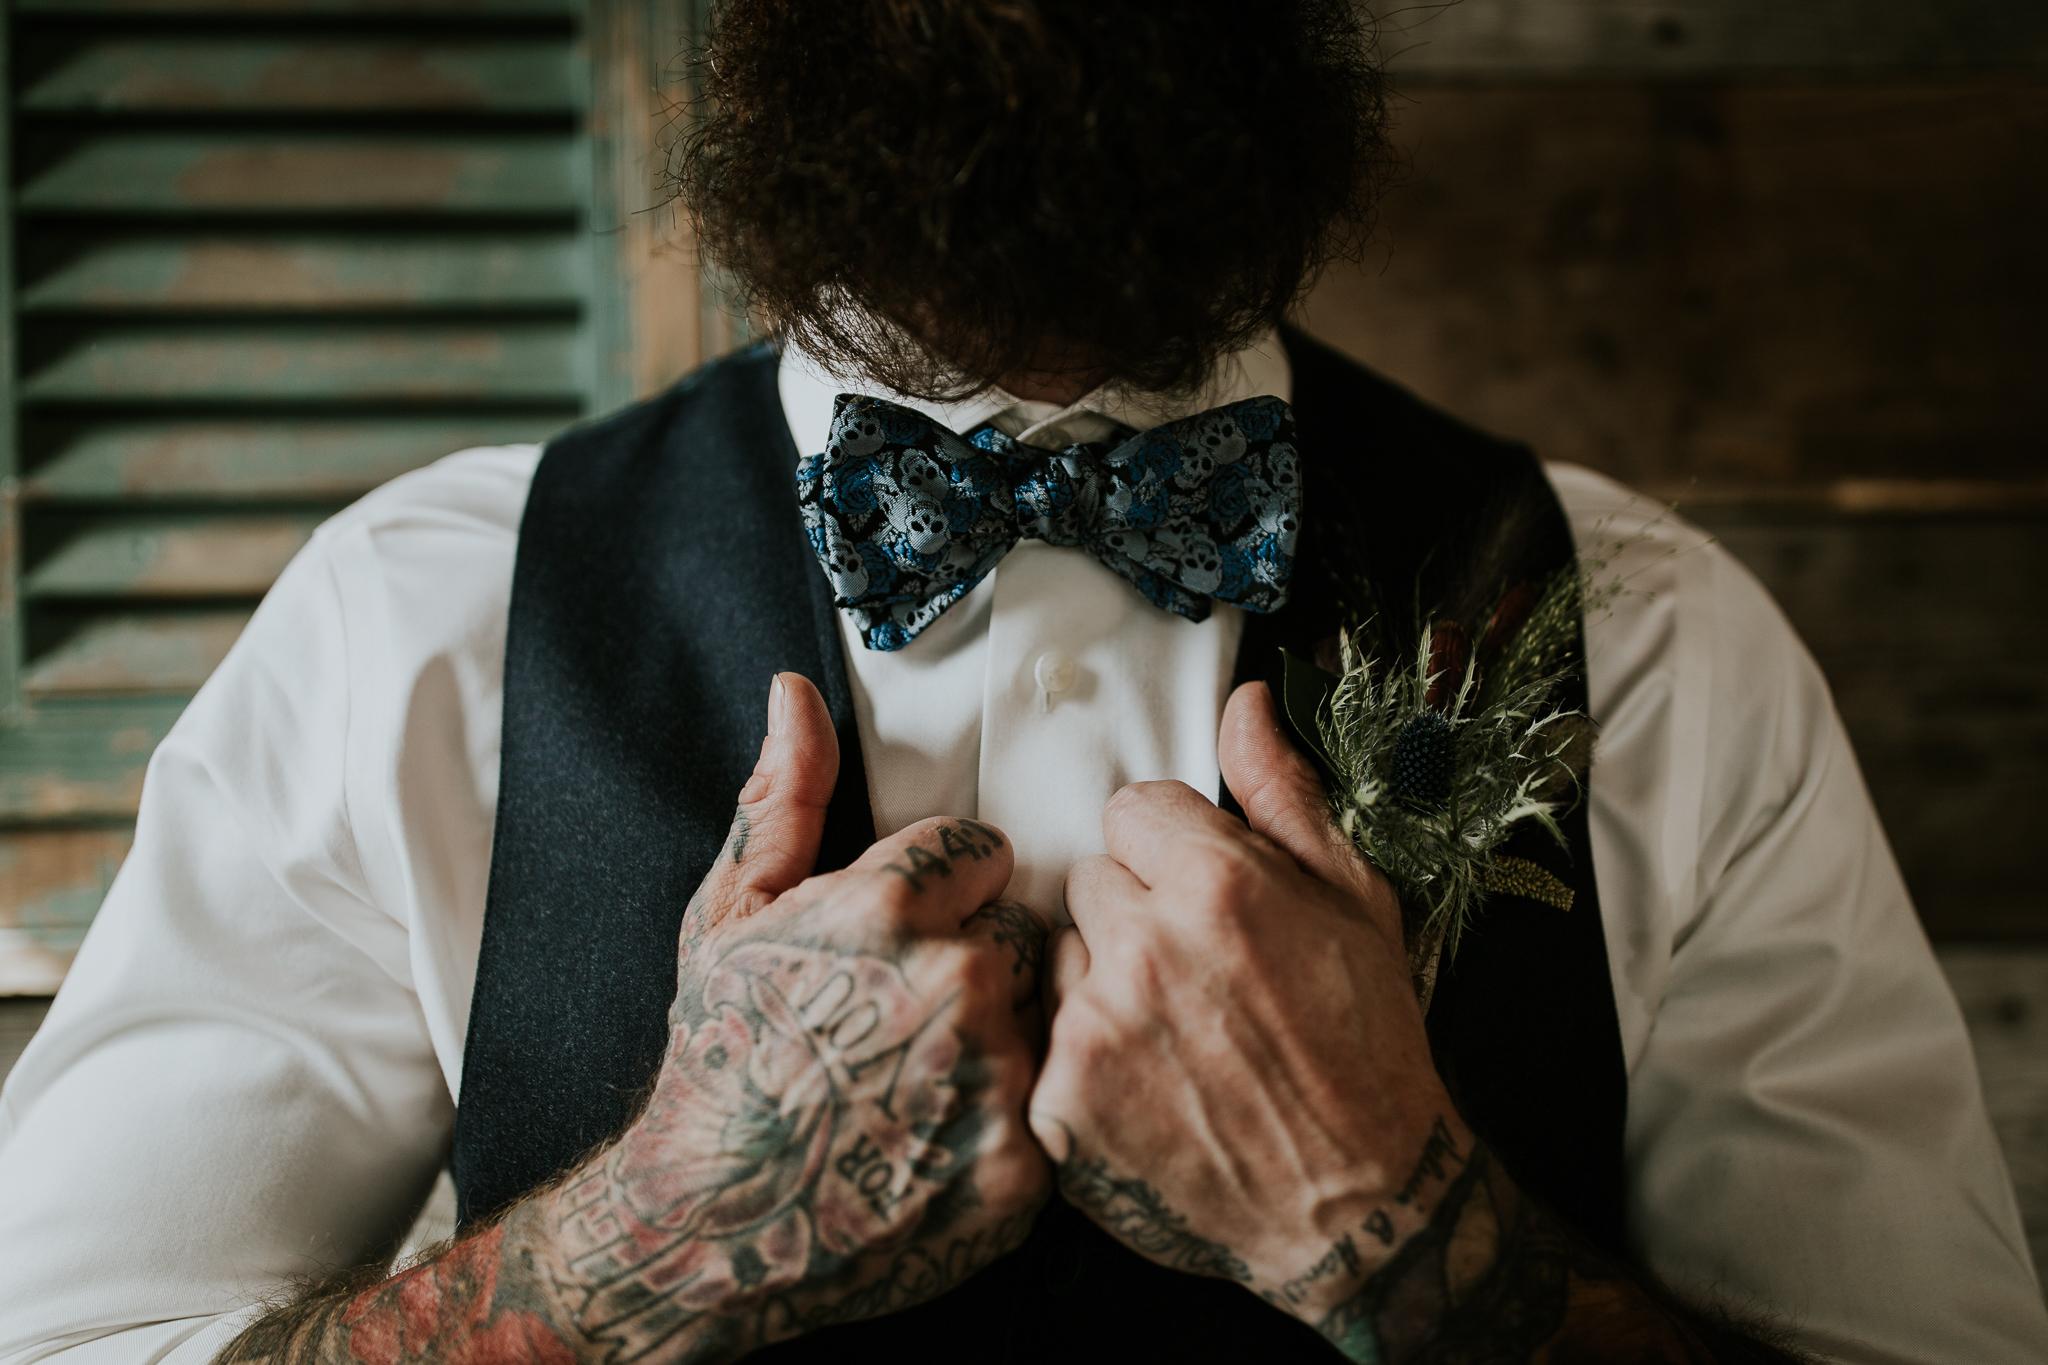 Close up of Groom's tattooed hands adjusting his wedding bowtie